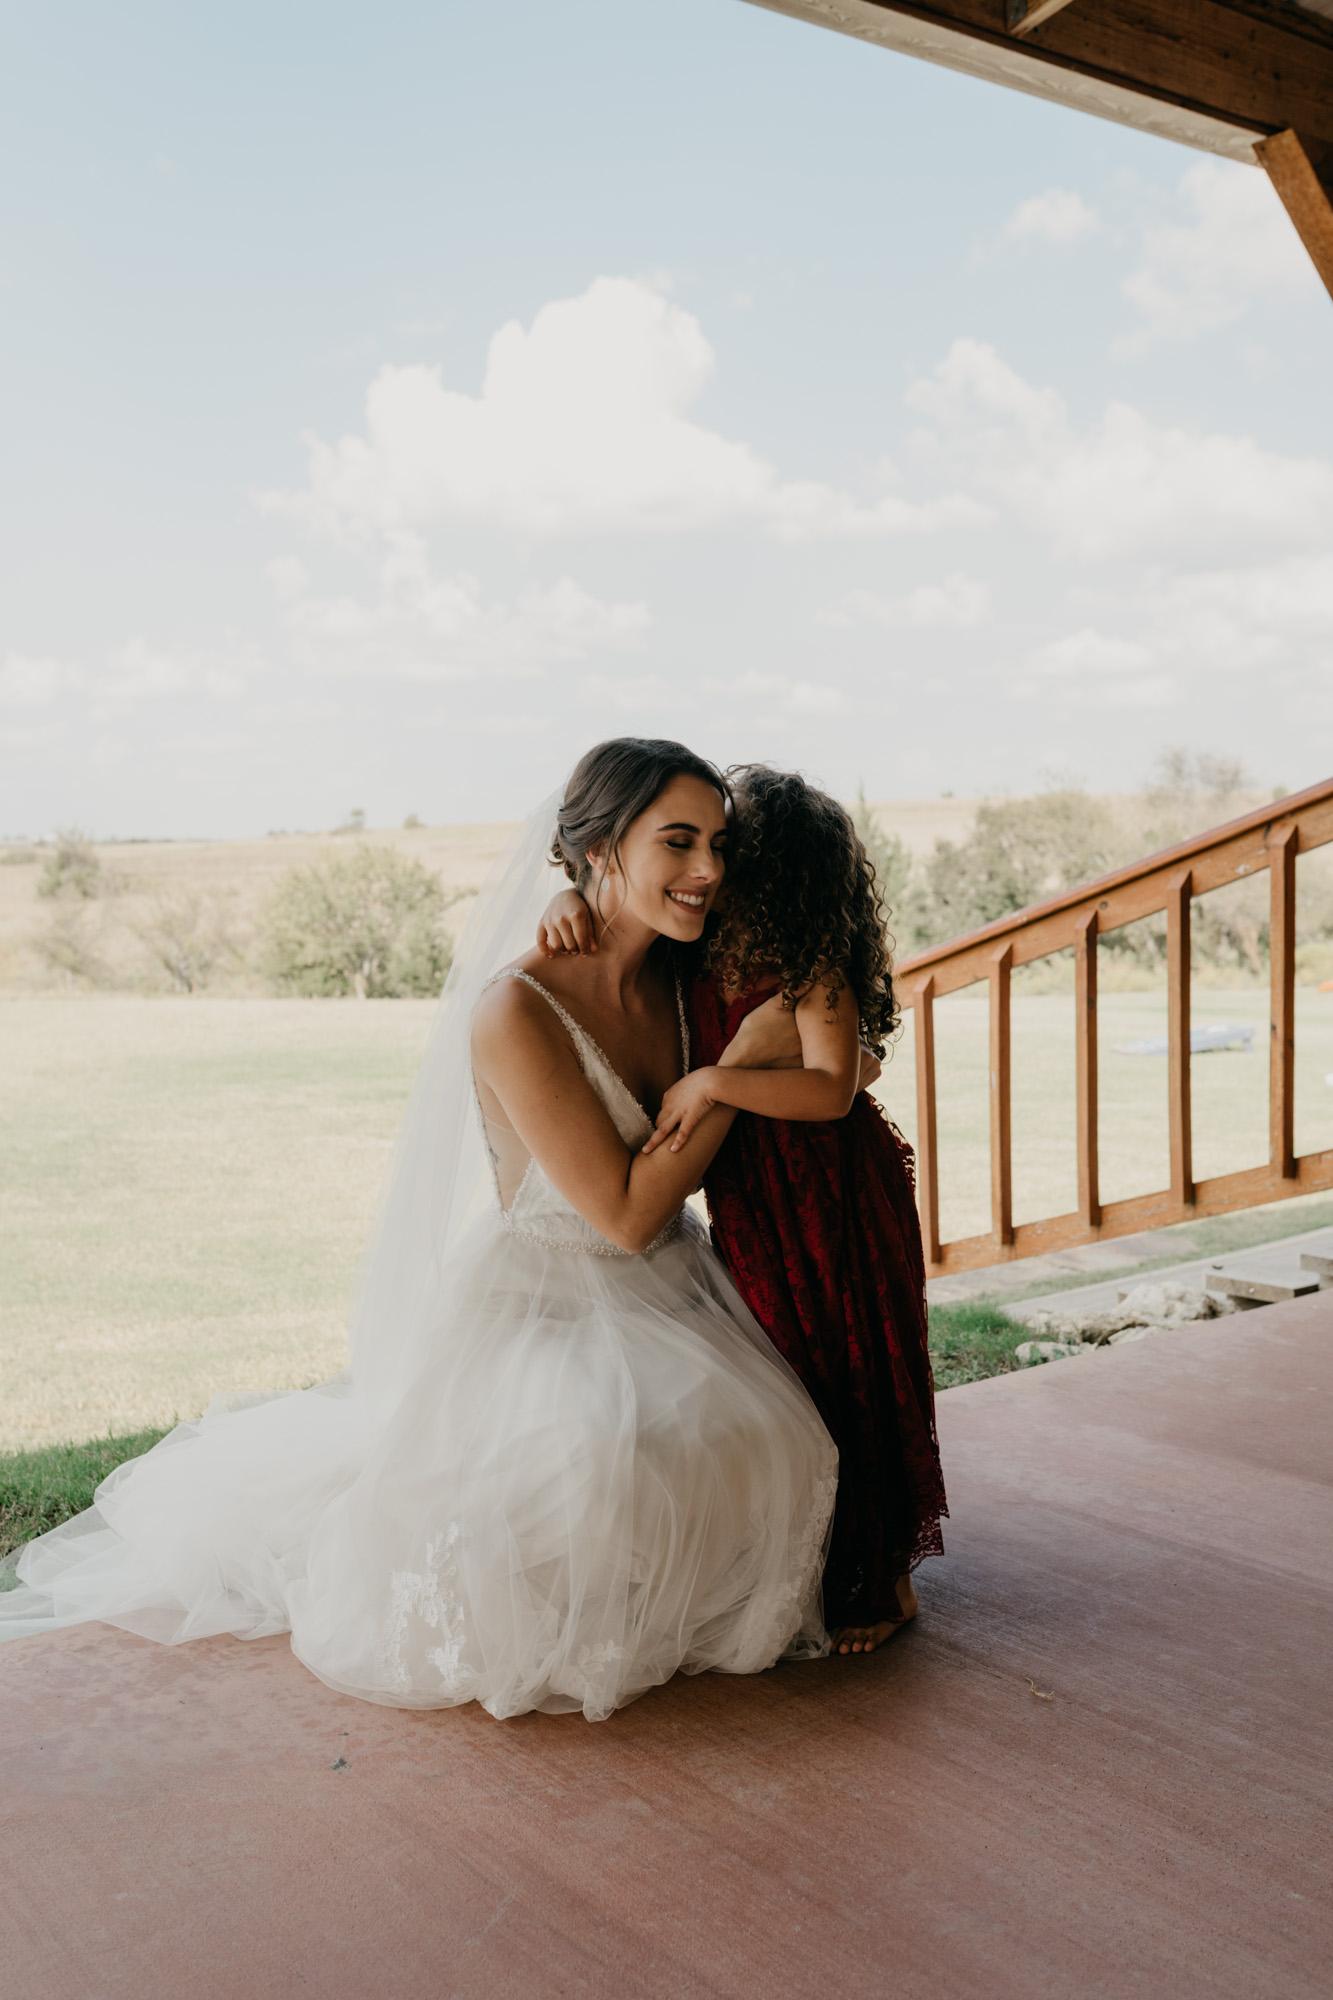 Bride hugging flower girl on porch of wedding venue